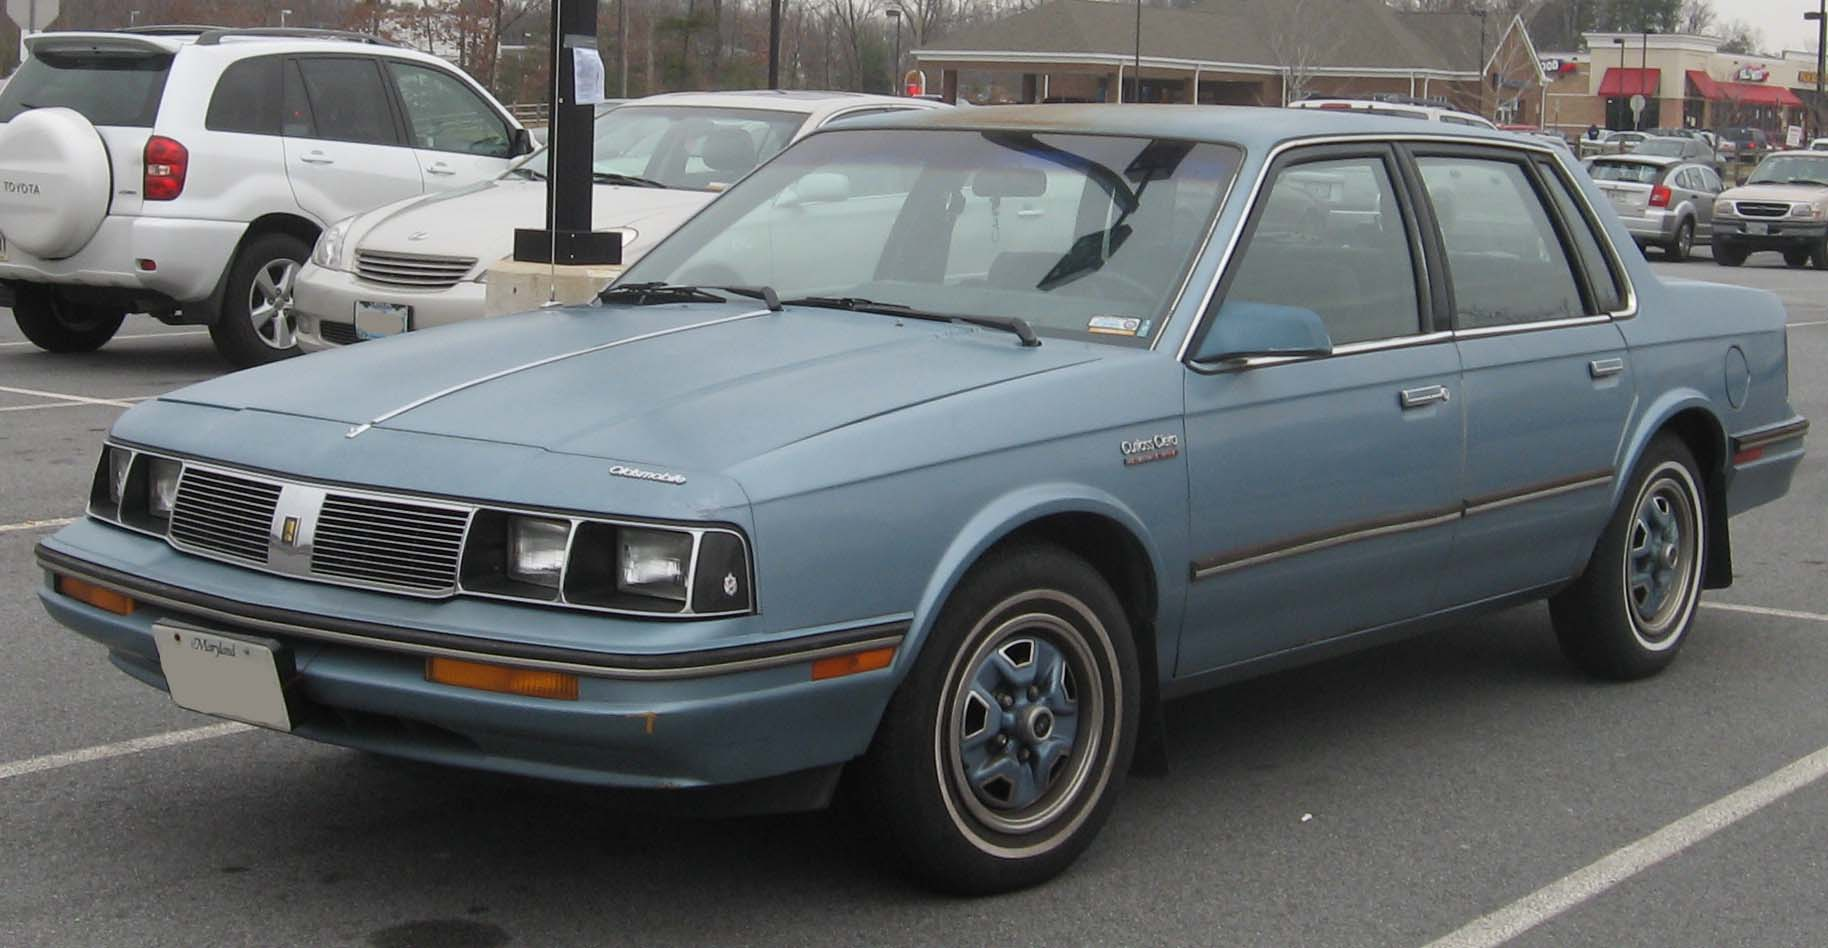 Oldsmobile Cutlass Ciera 1981 - 1996 Coupe #7